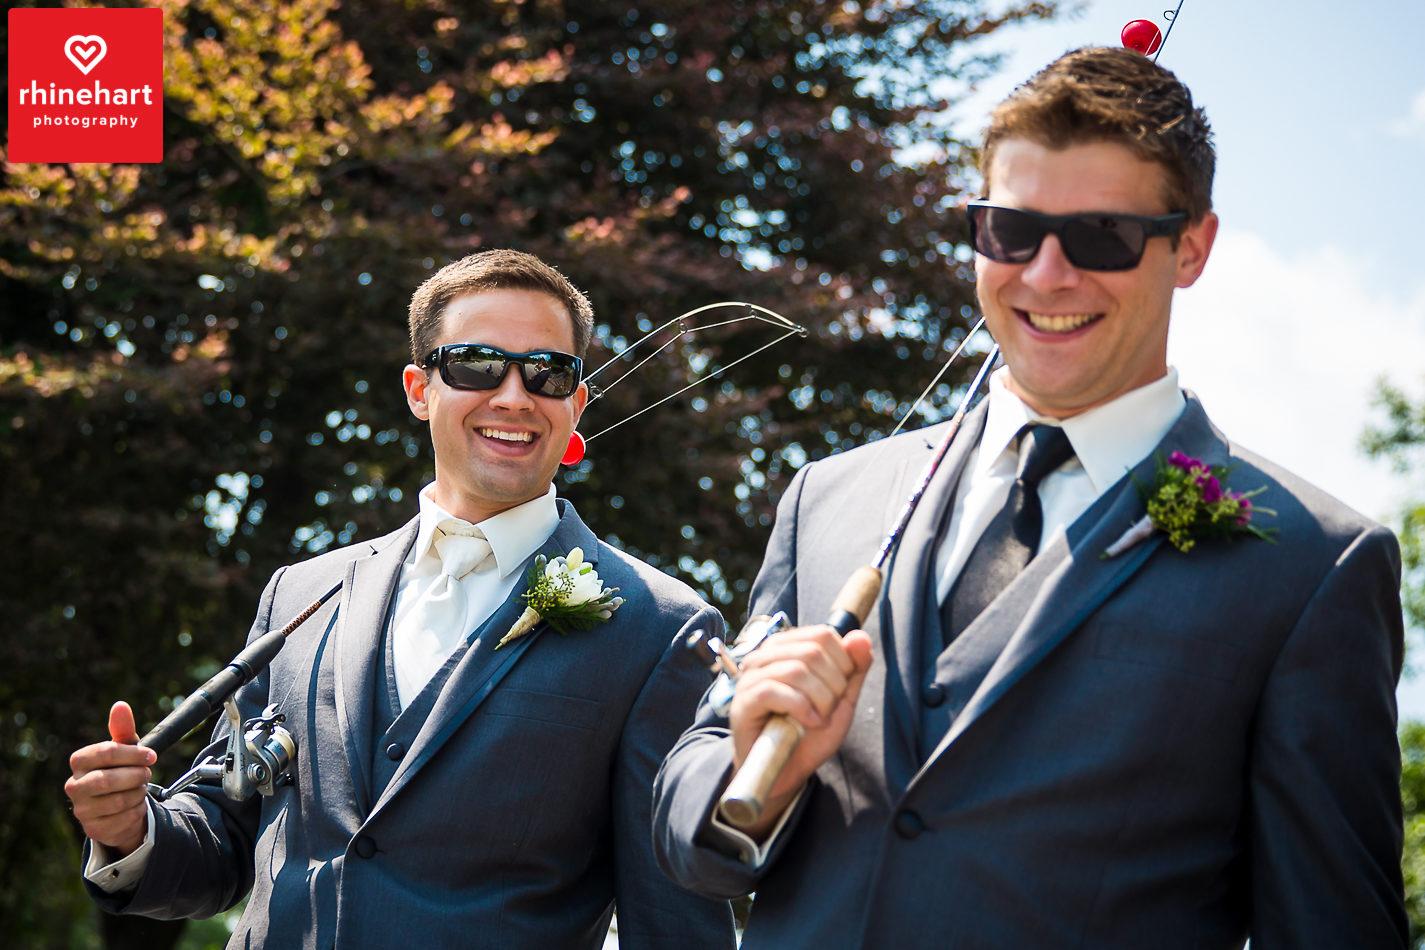 glasbern-inn-wedding-photographer-207